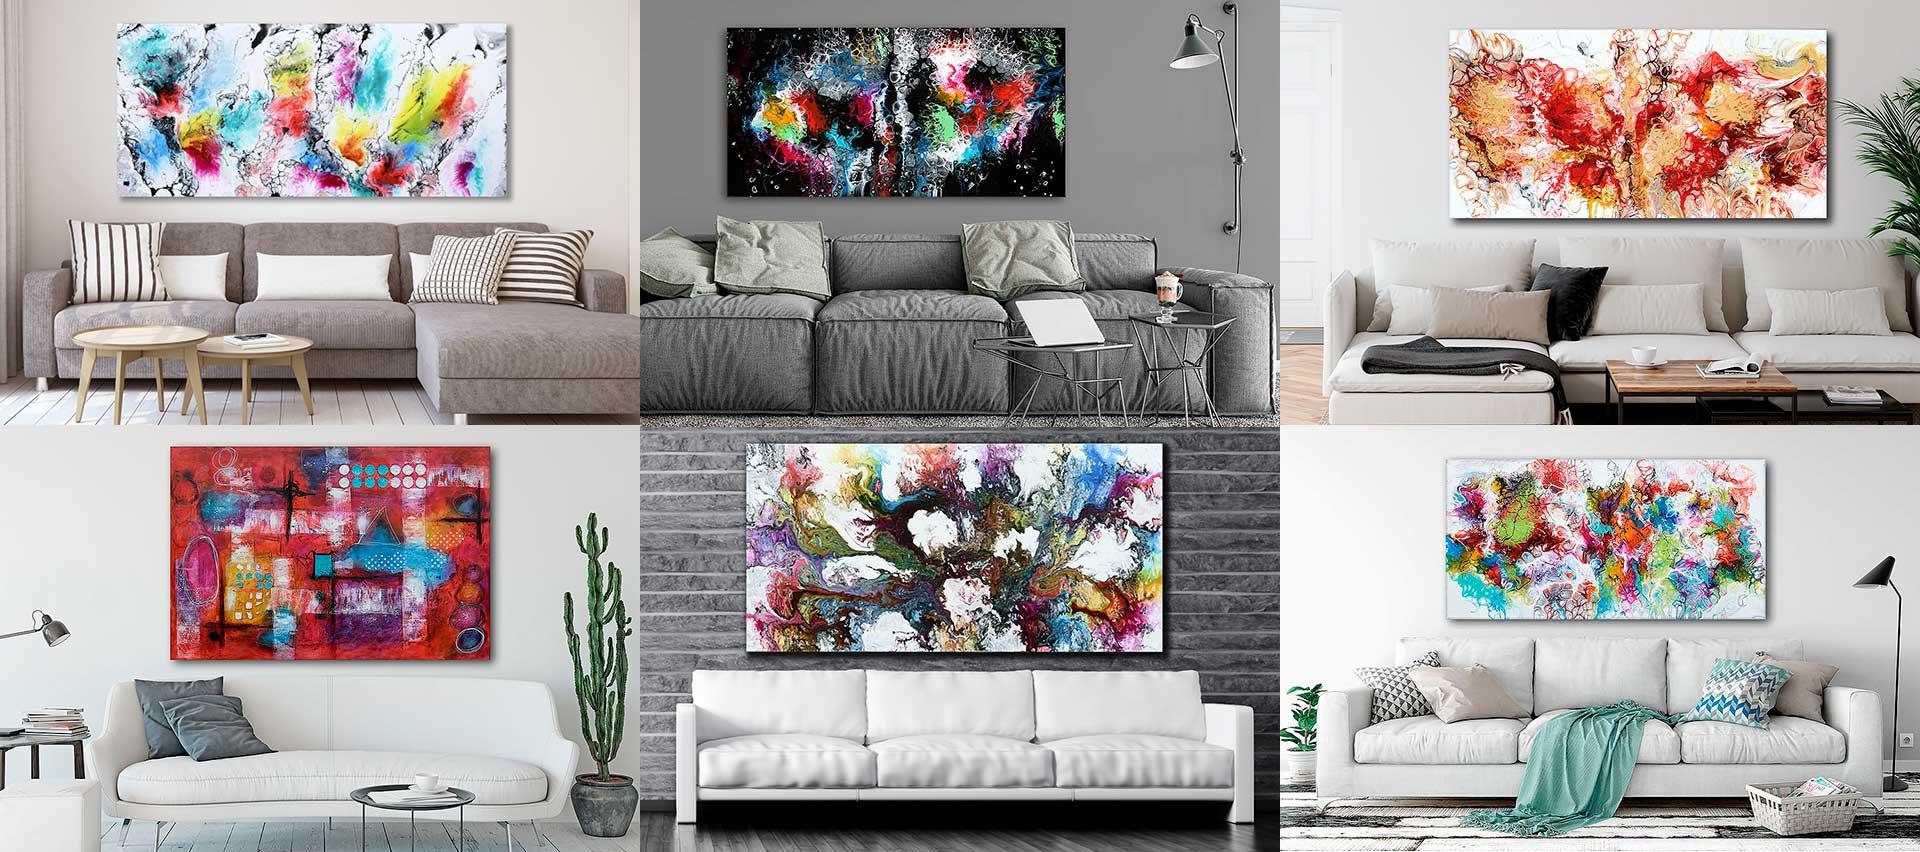 Gemälde Malerei Wandbilder Acrylgemälde Acrylbilder Acrylmalerei Kunstwerke moderne abstrakte Kunst von Michael Lönfeldt online kaufen